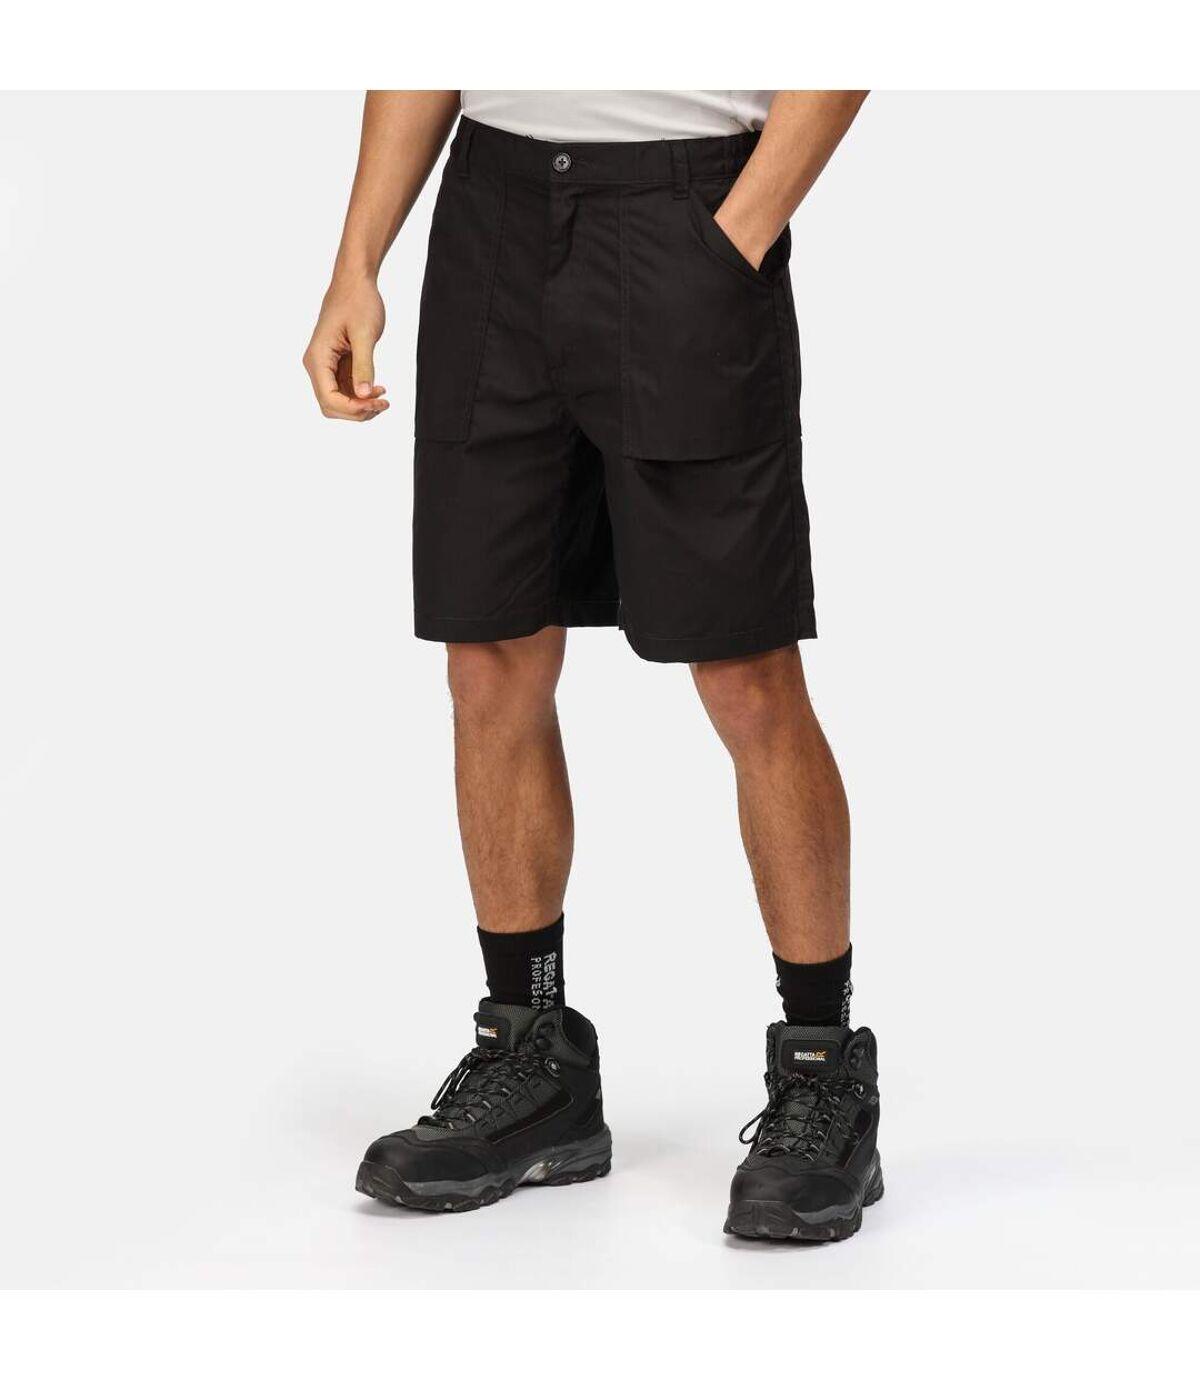 Regatta Mens New Action Sports Shorts (Black) - UTRW1235